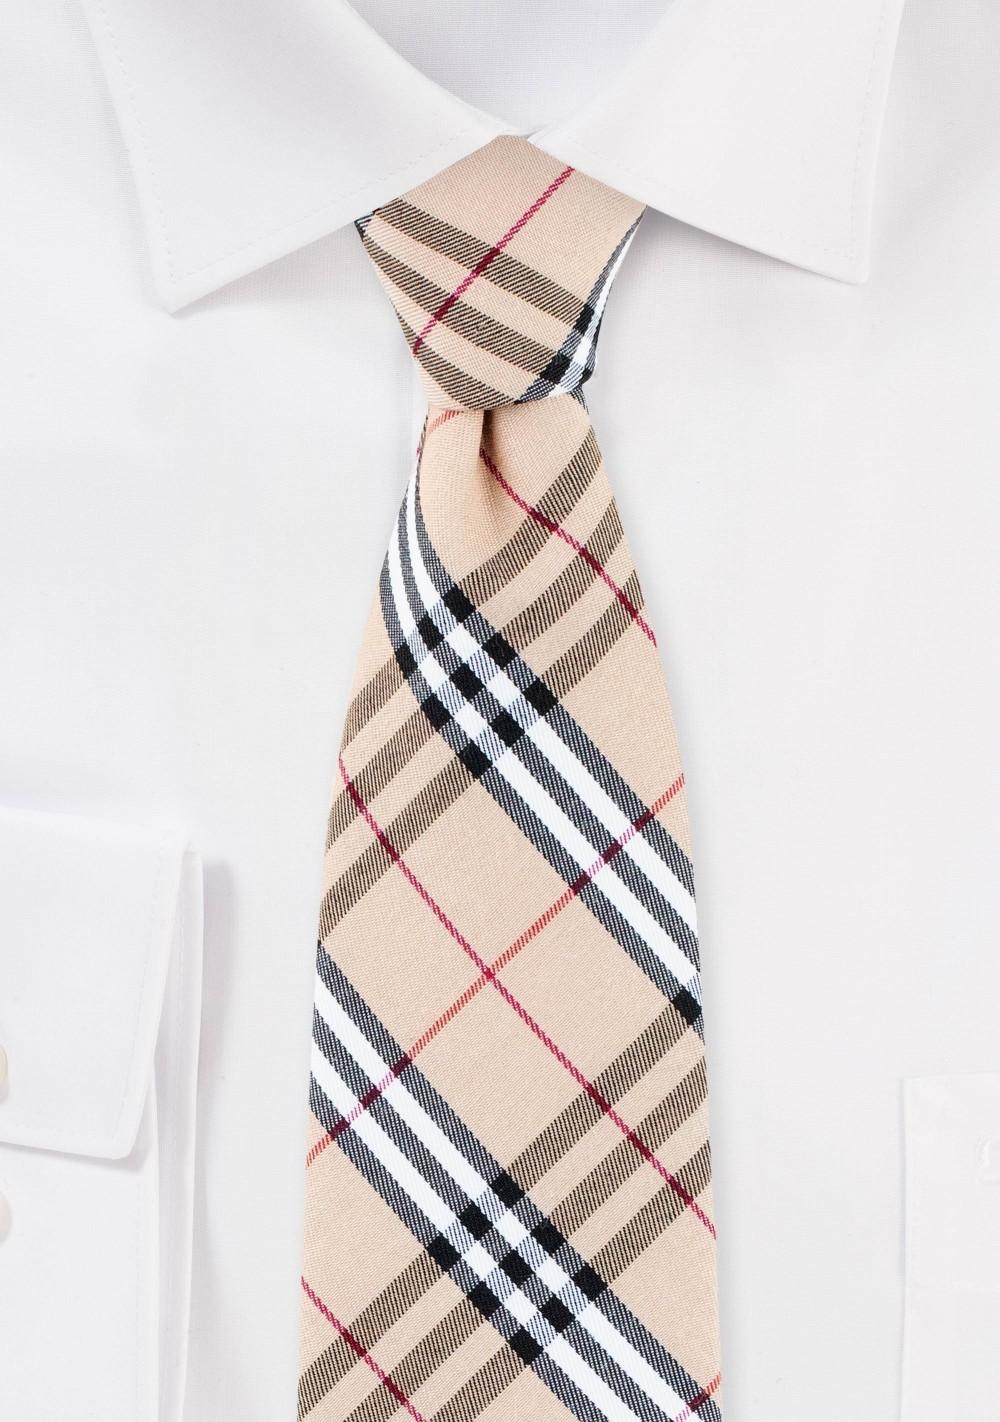 Tan Tartan Plaid Cotton Summer Tie